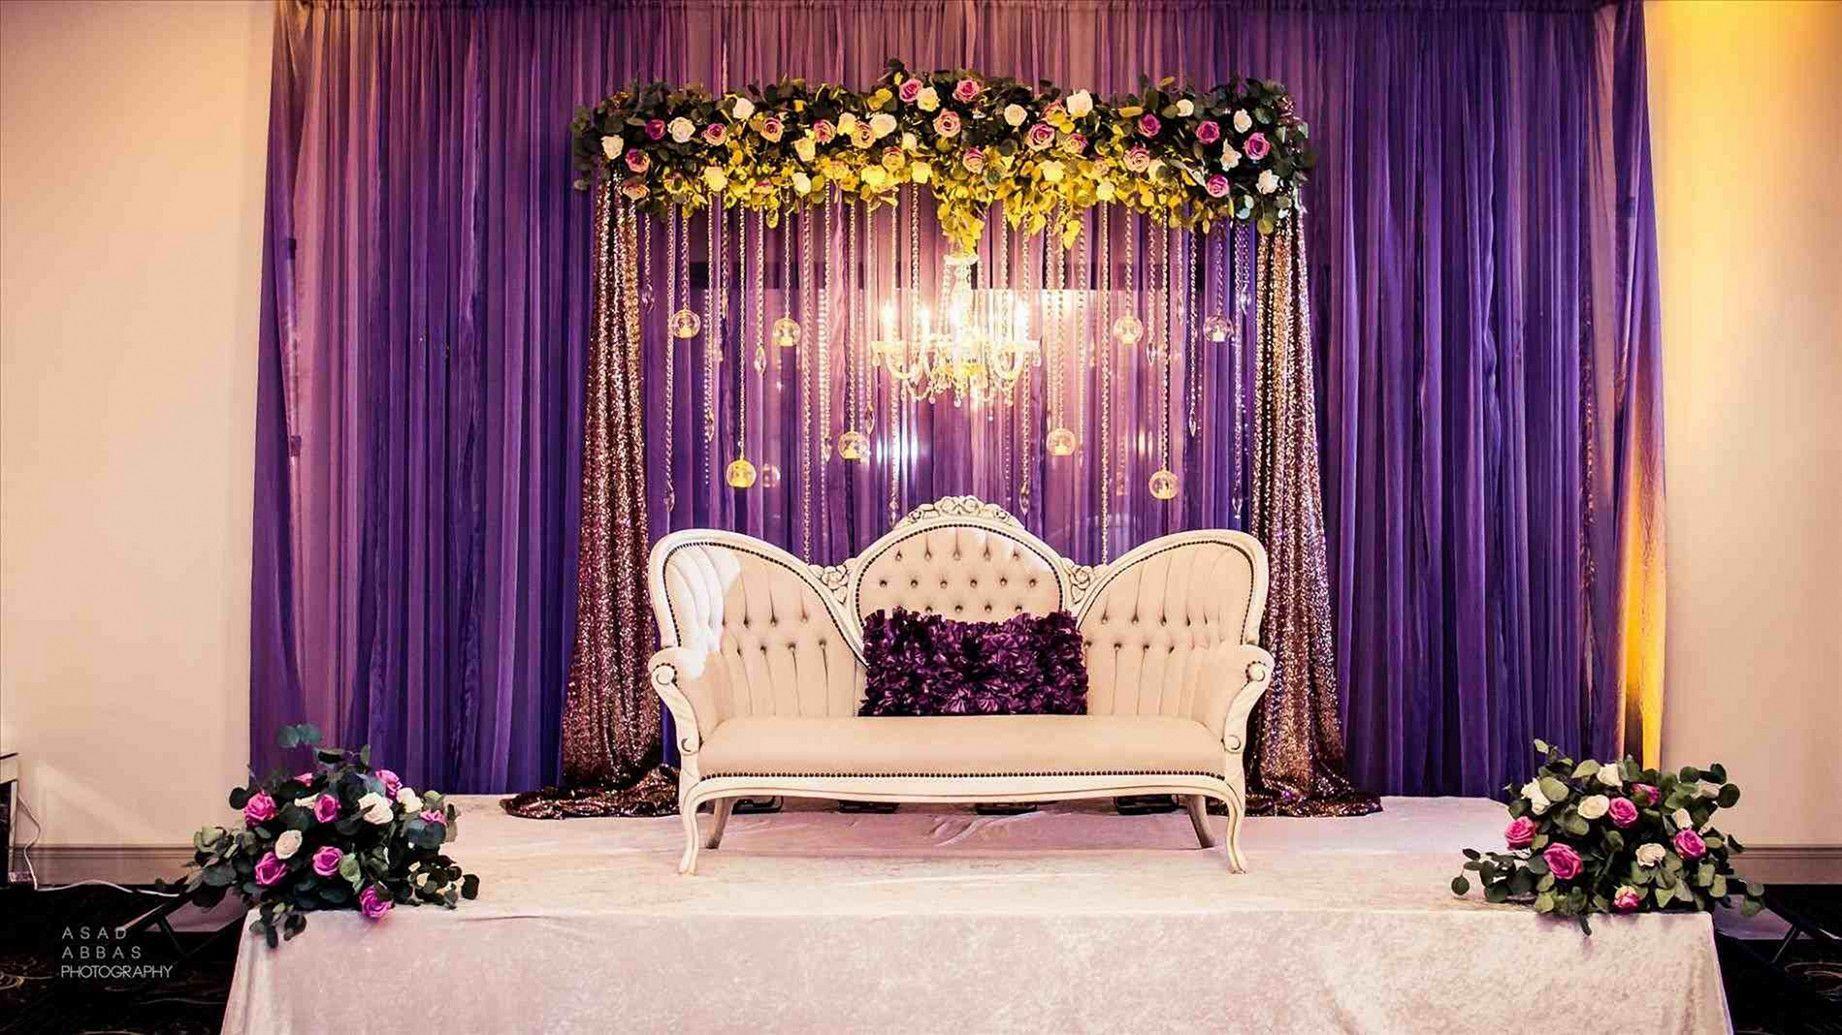 13 Beautiful Wedding Decoration Ideas For Trend 2020 Wedding Stage Decorations Beautiful Wedding Decorations Simple Wedding Decorations